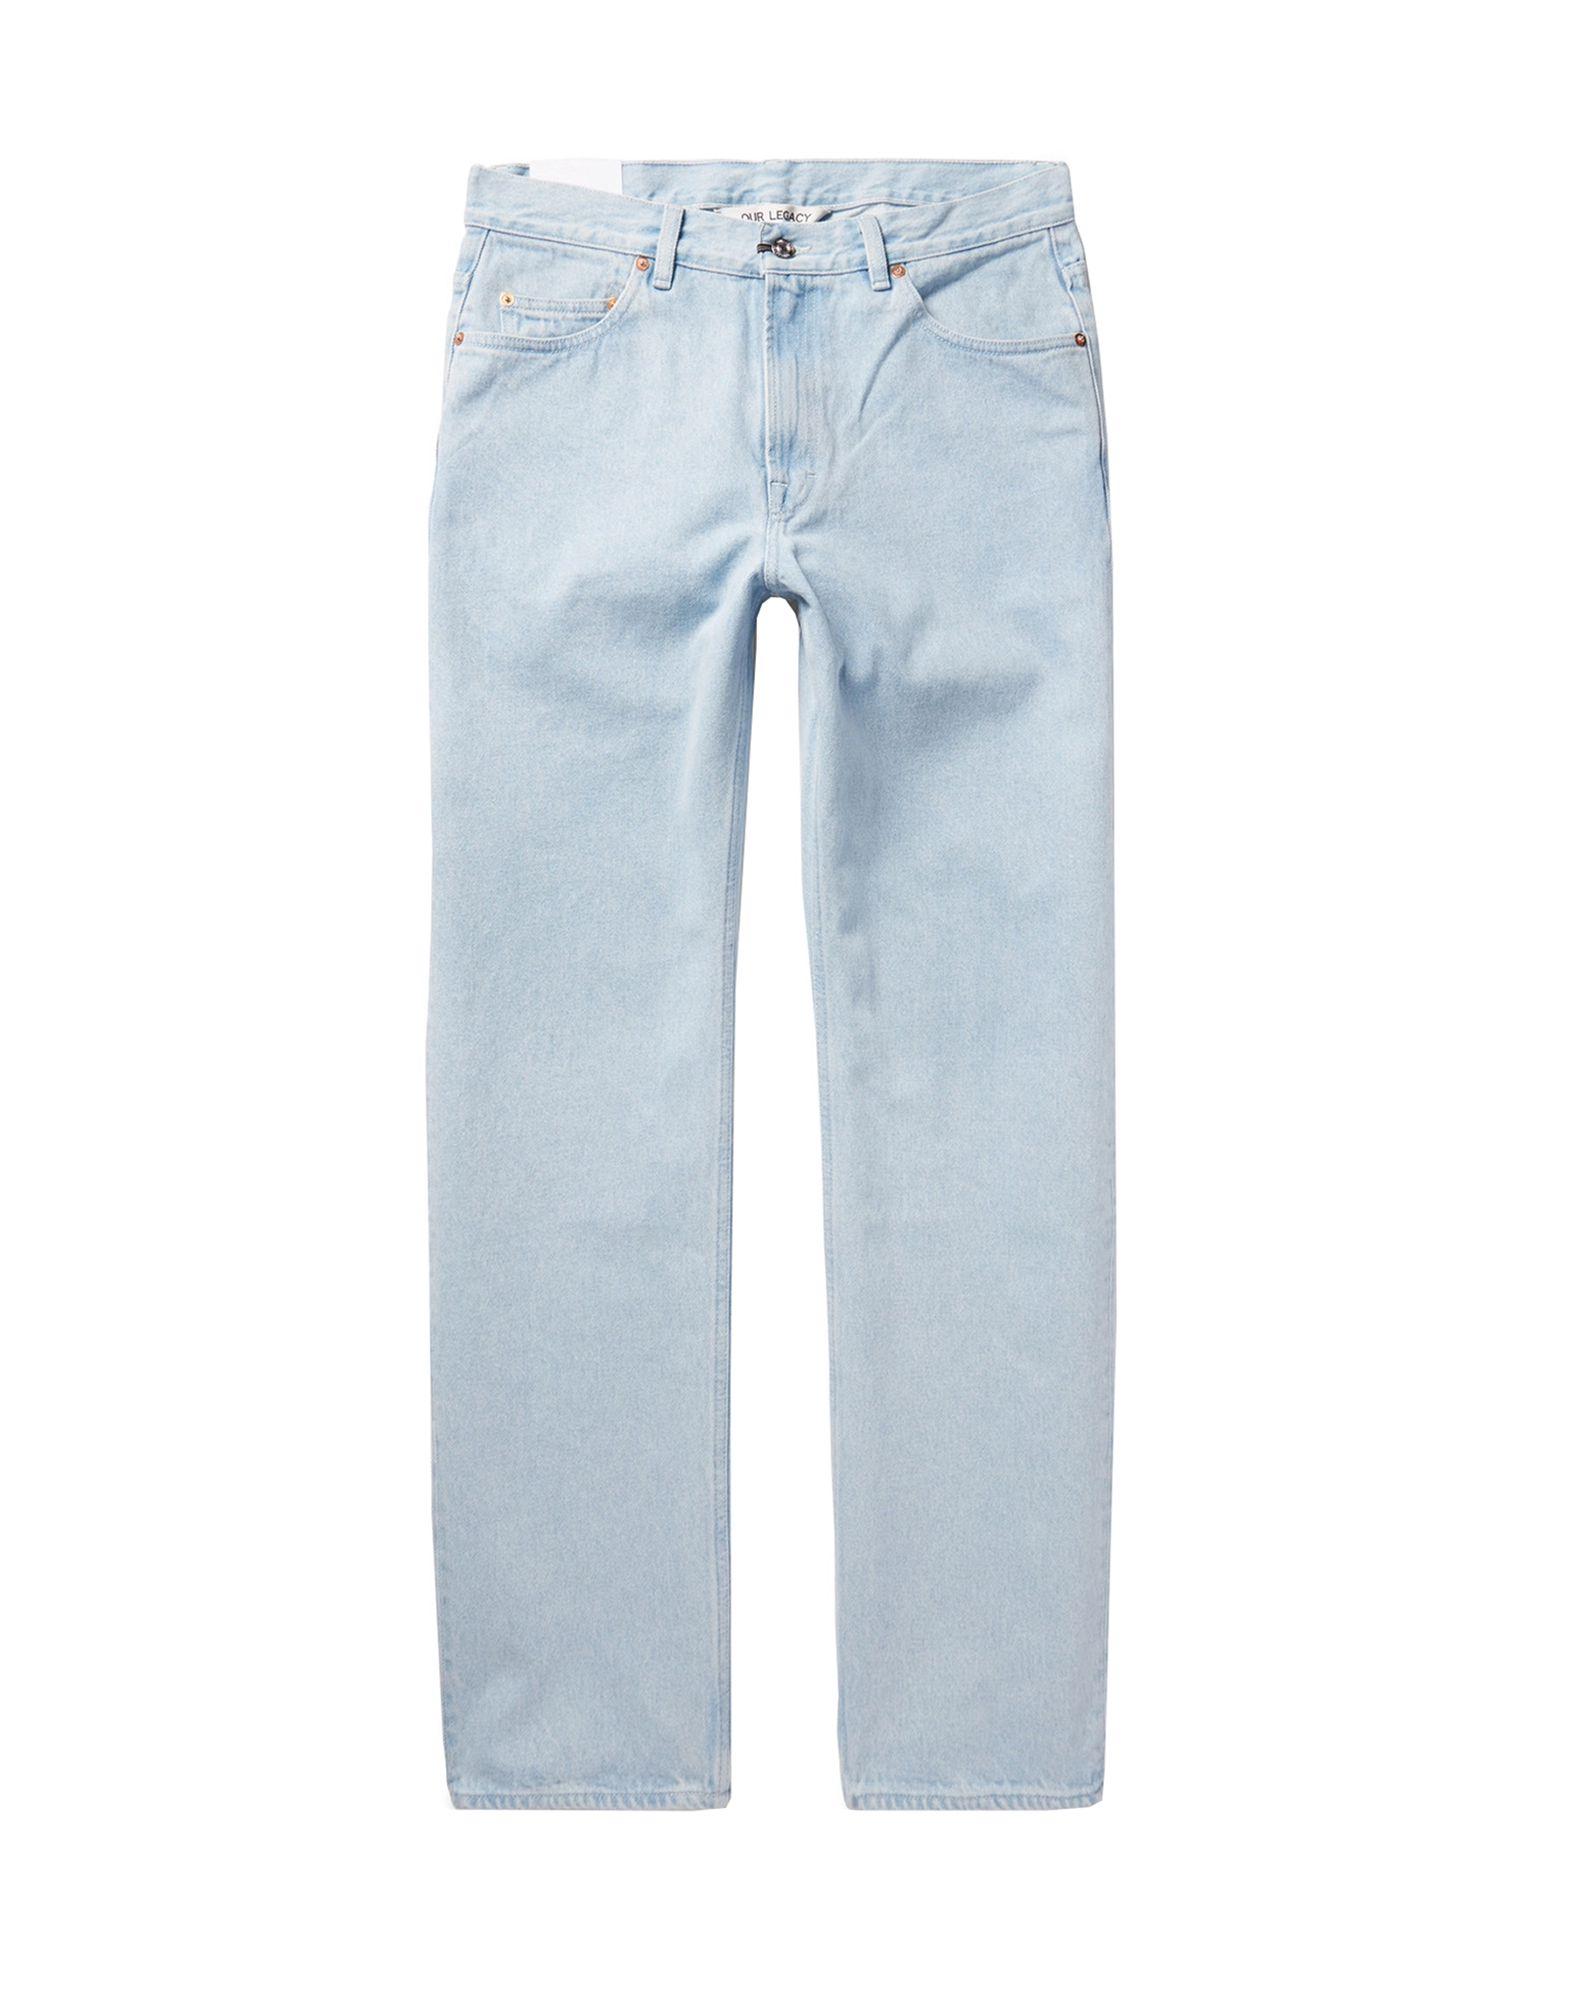 d6ef2c0a59feb Our Legacy Denim Pants - Men Our Legacy Denim Pants online on YOOX ...